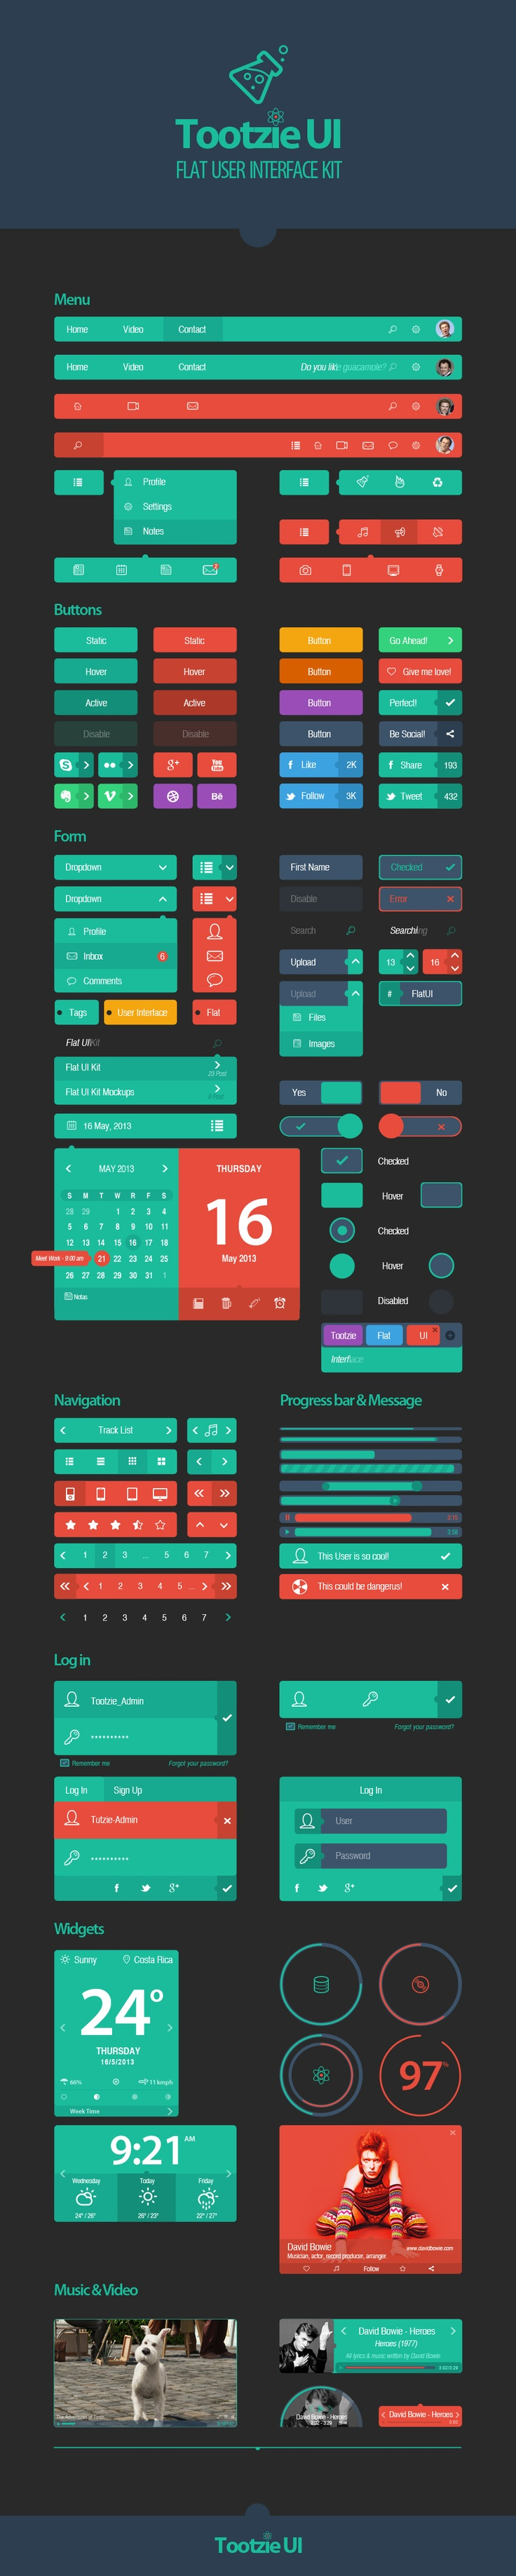 Tootzie UI Kit - User Interface Design